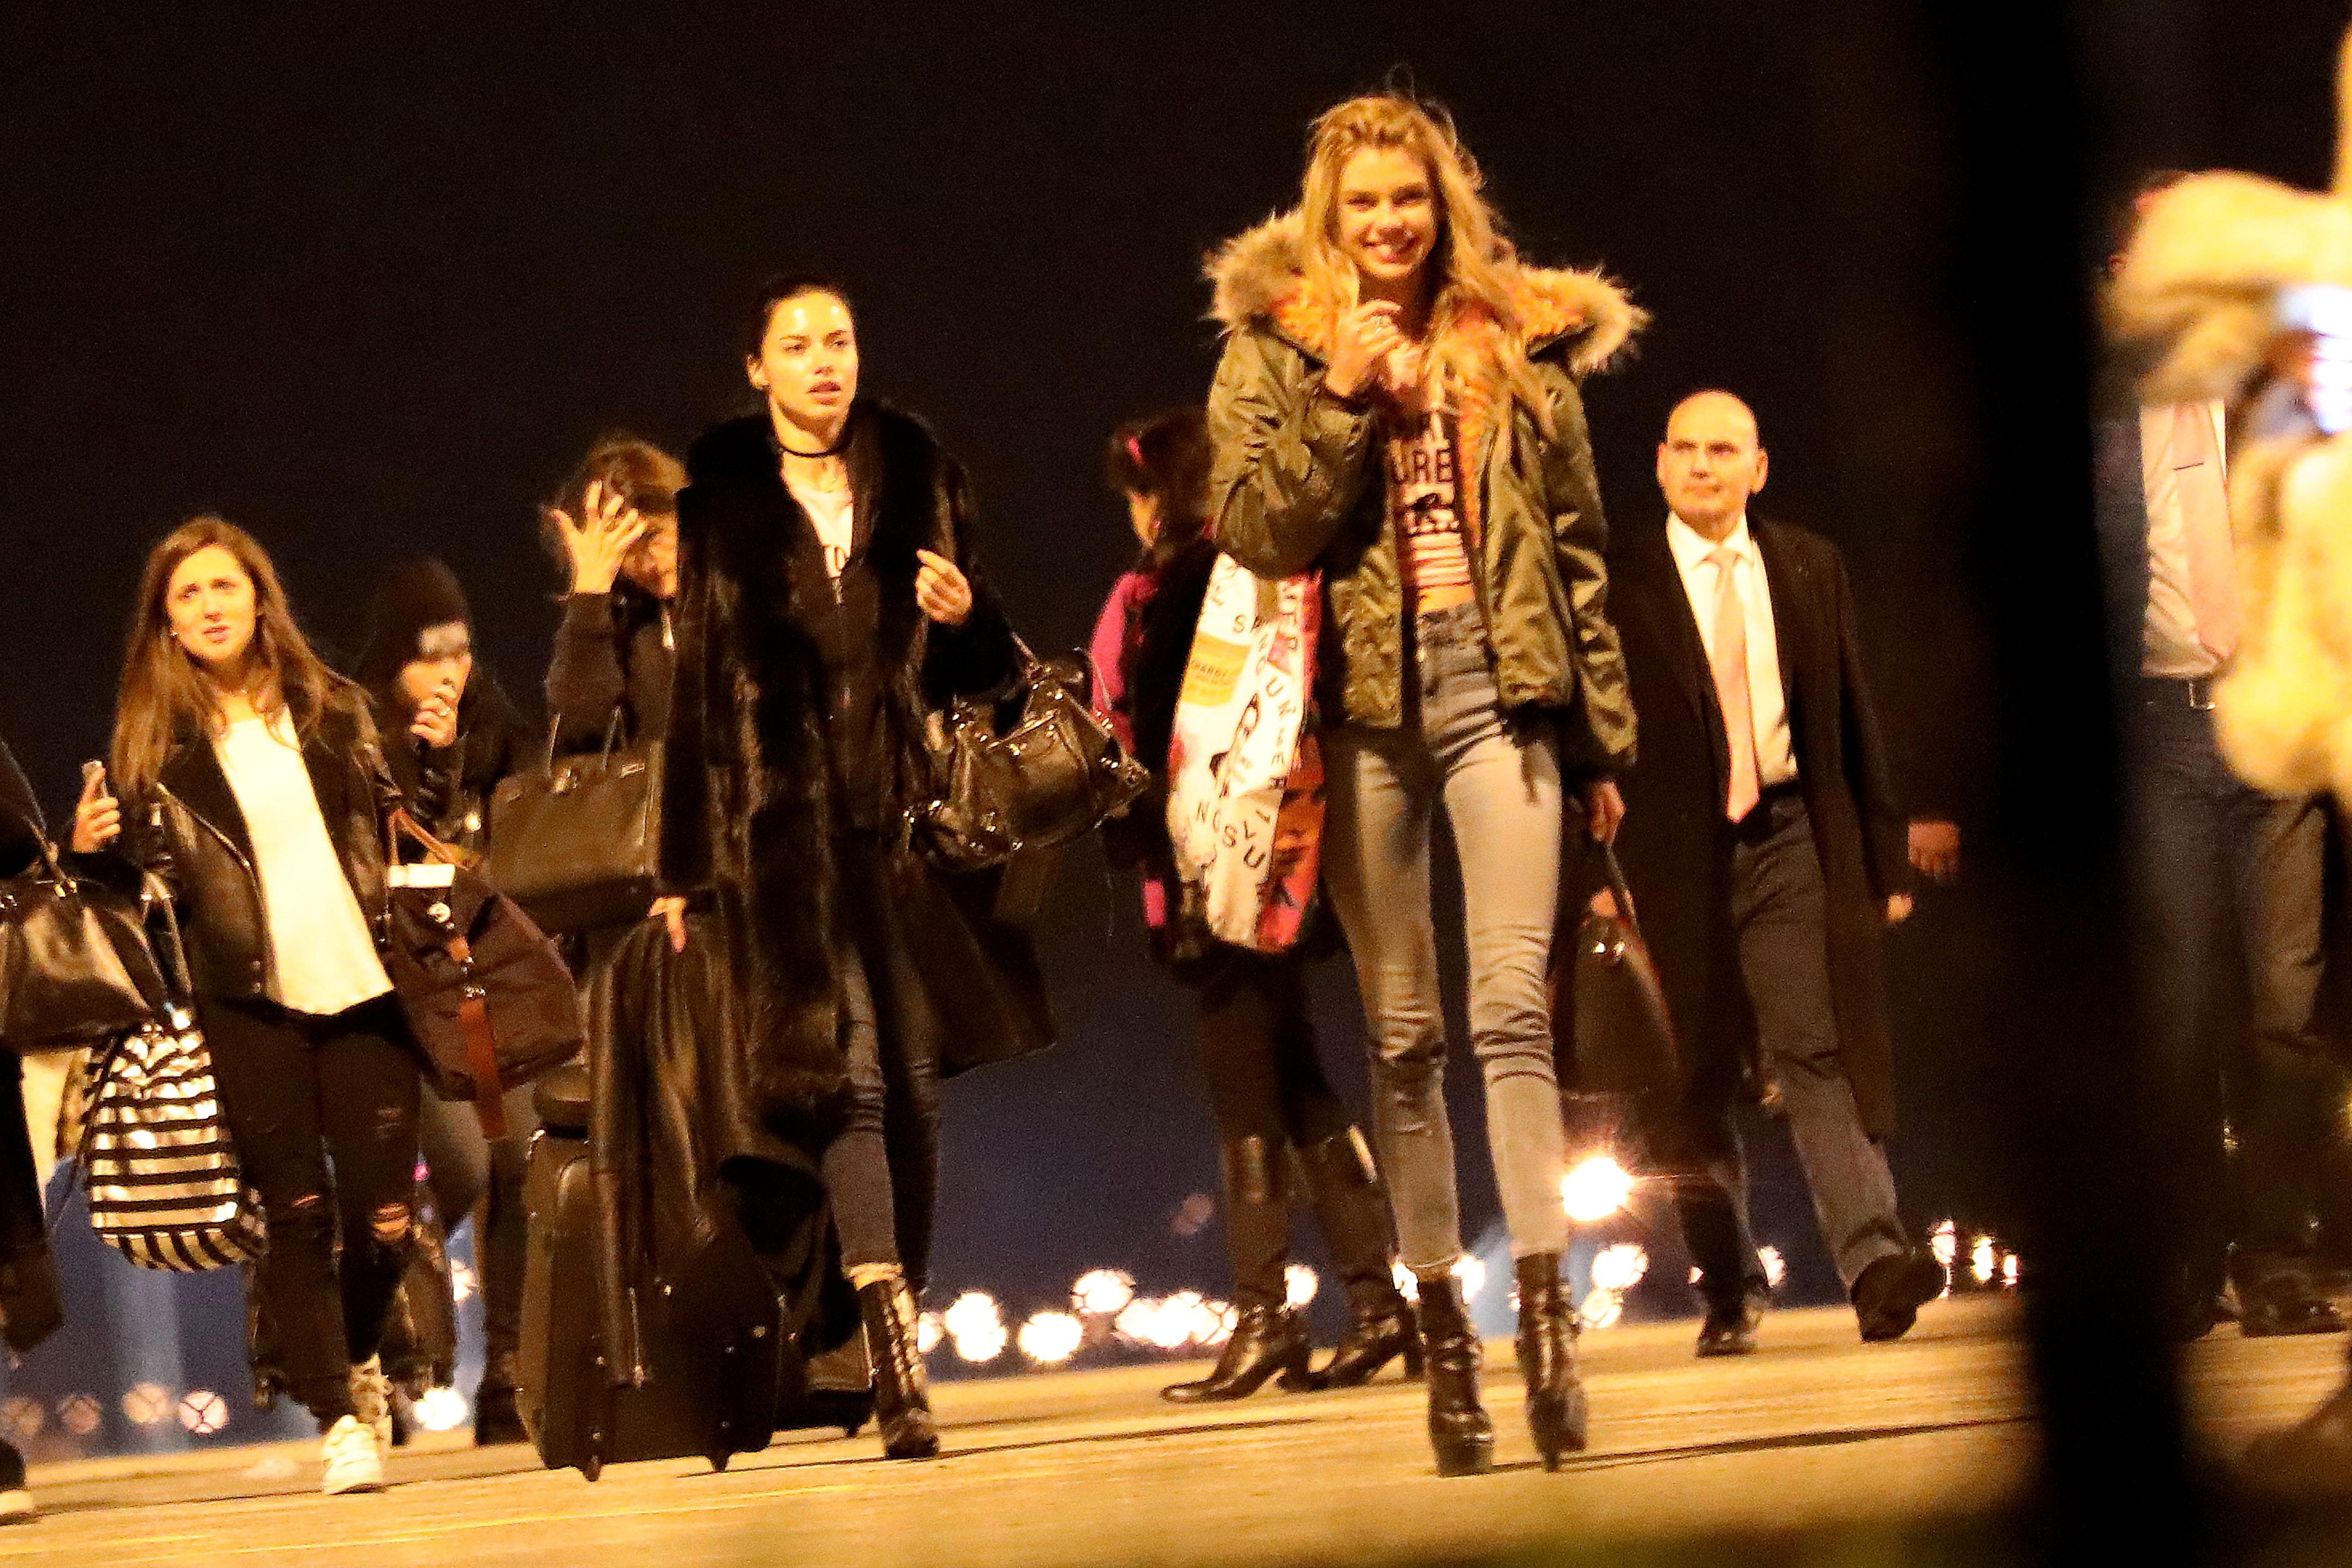 Victoria's Secret Angels at Roissy Airport. (Photo credit: Splash News)